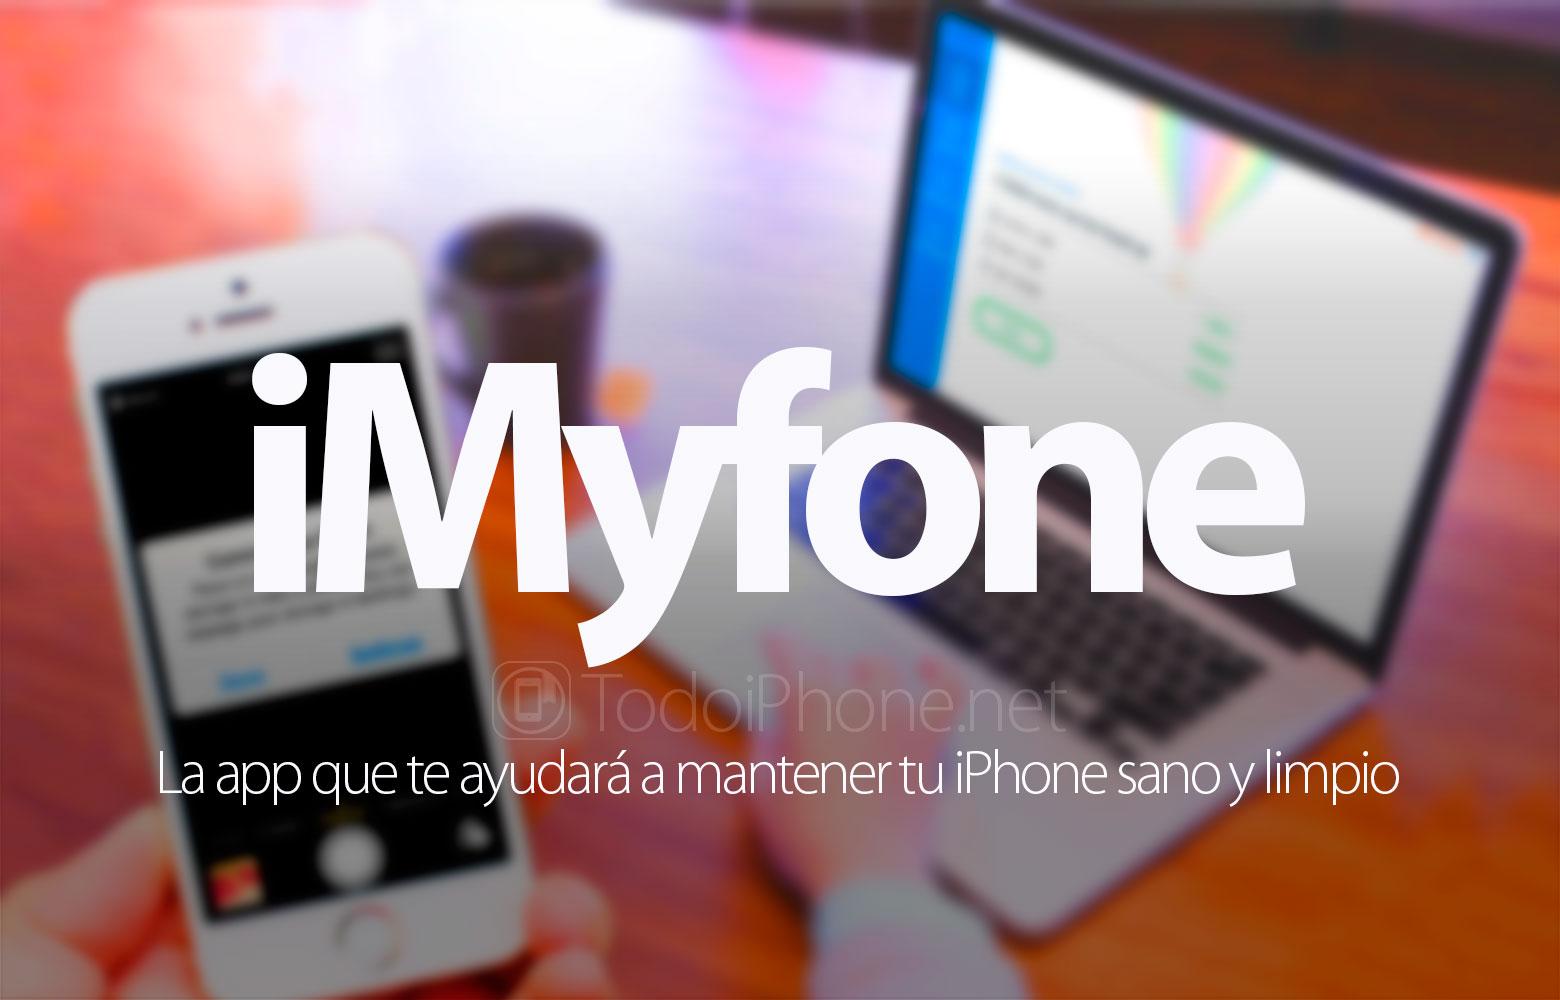 imyfone-app-mantener-iphone-sano-limpio